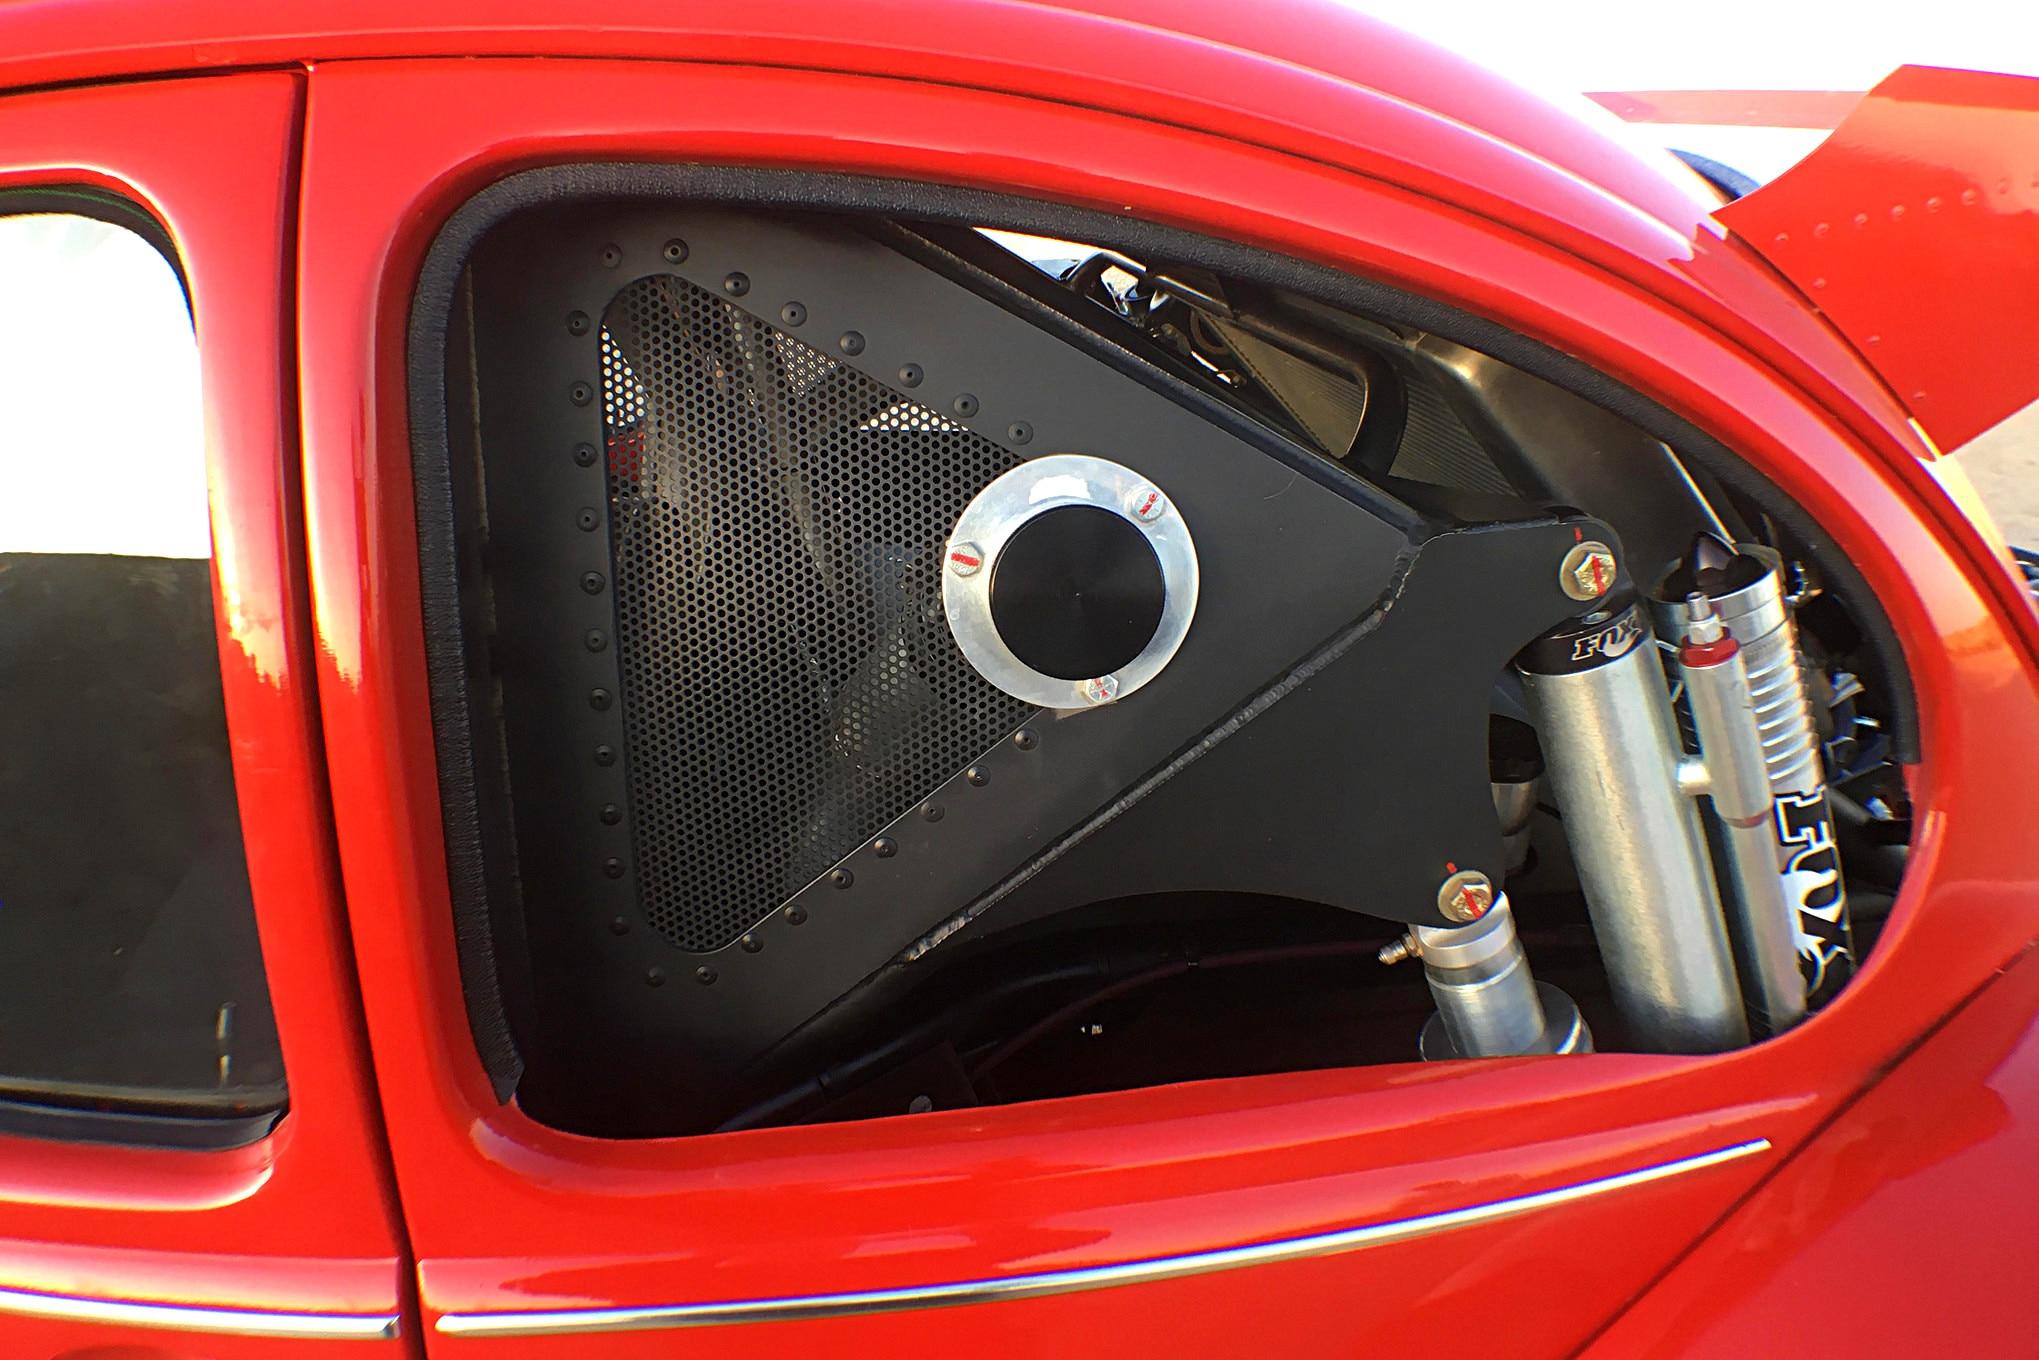 024 vw baja bug bfg walker evans pro am tough light fox chevy ls1 side close up.JPG